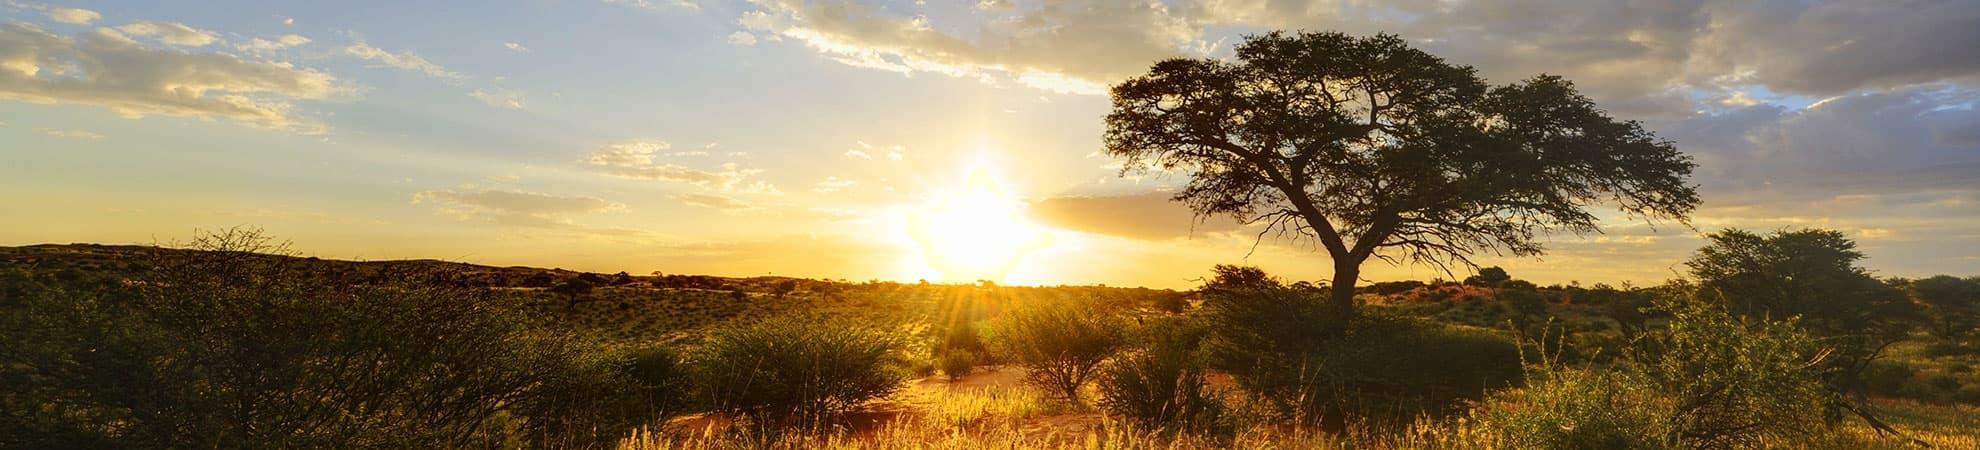 Voyage Le désert du Kalahari - Namibie